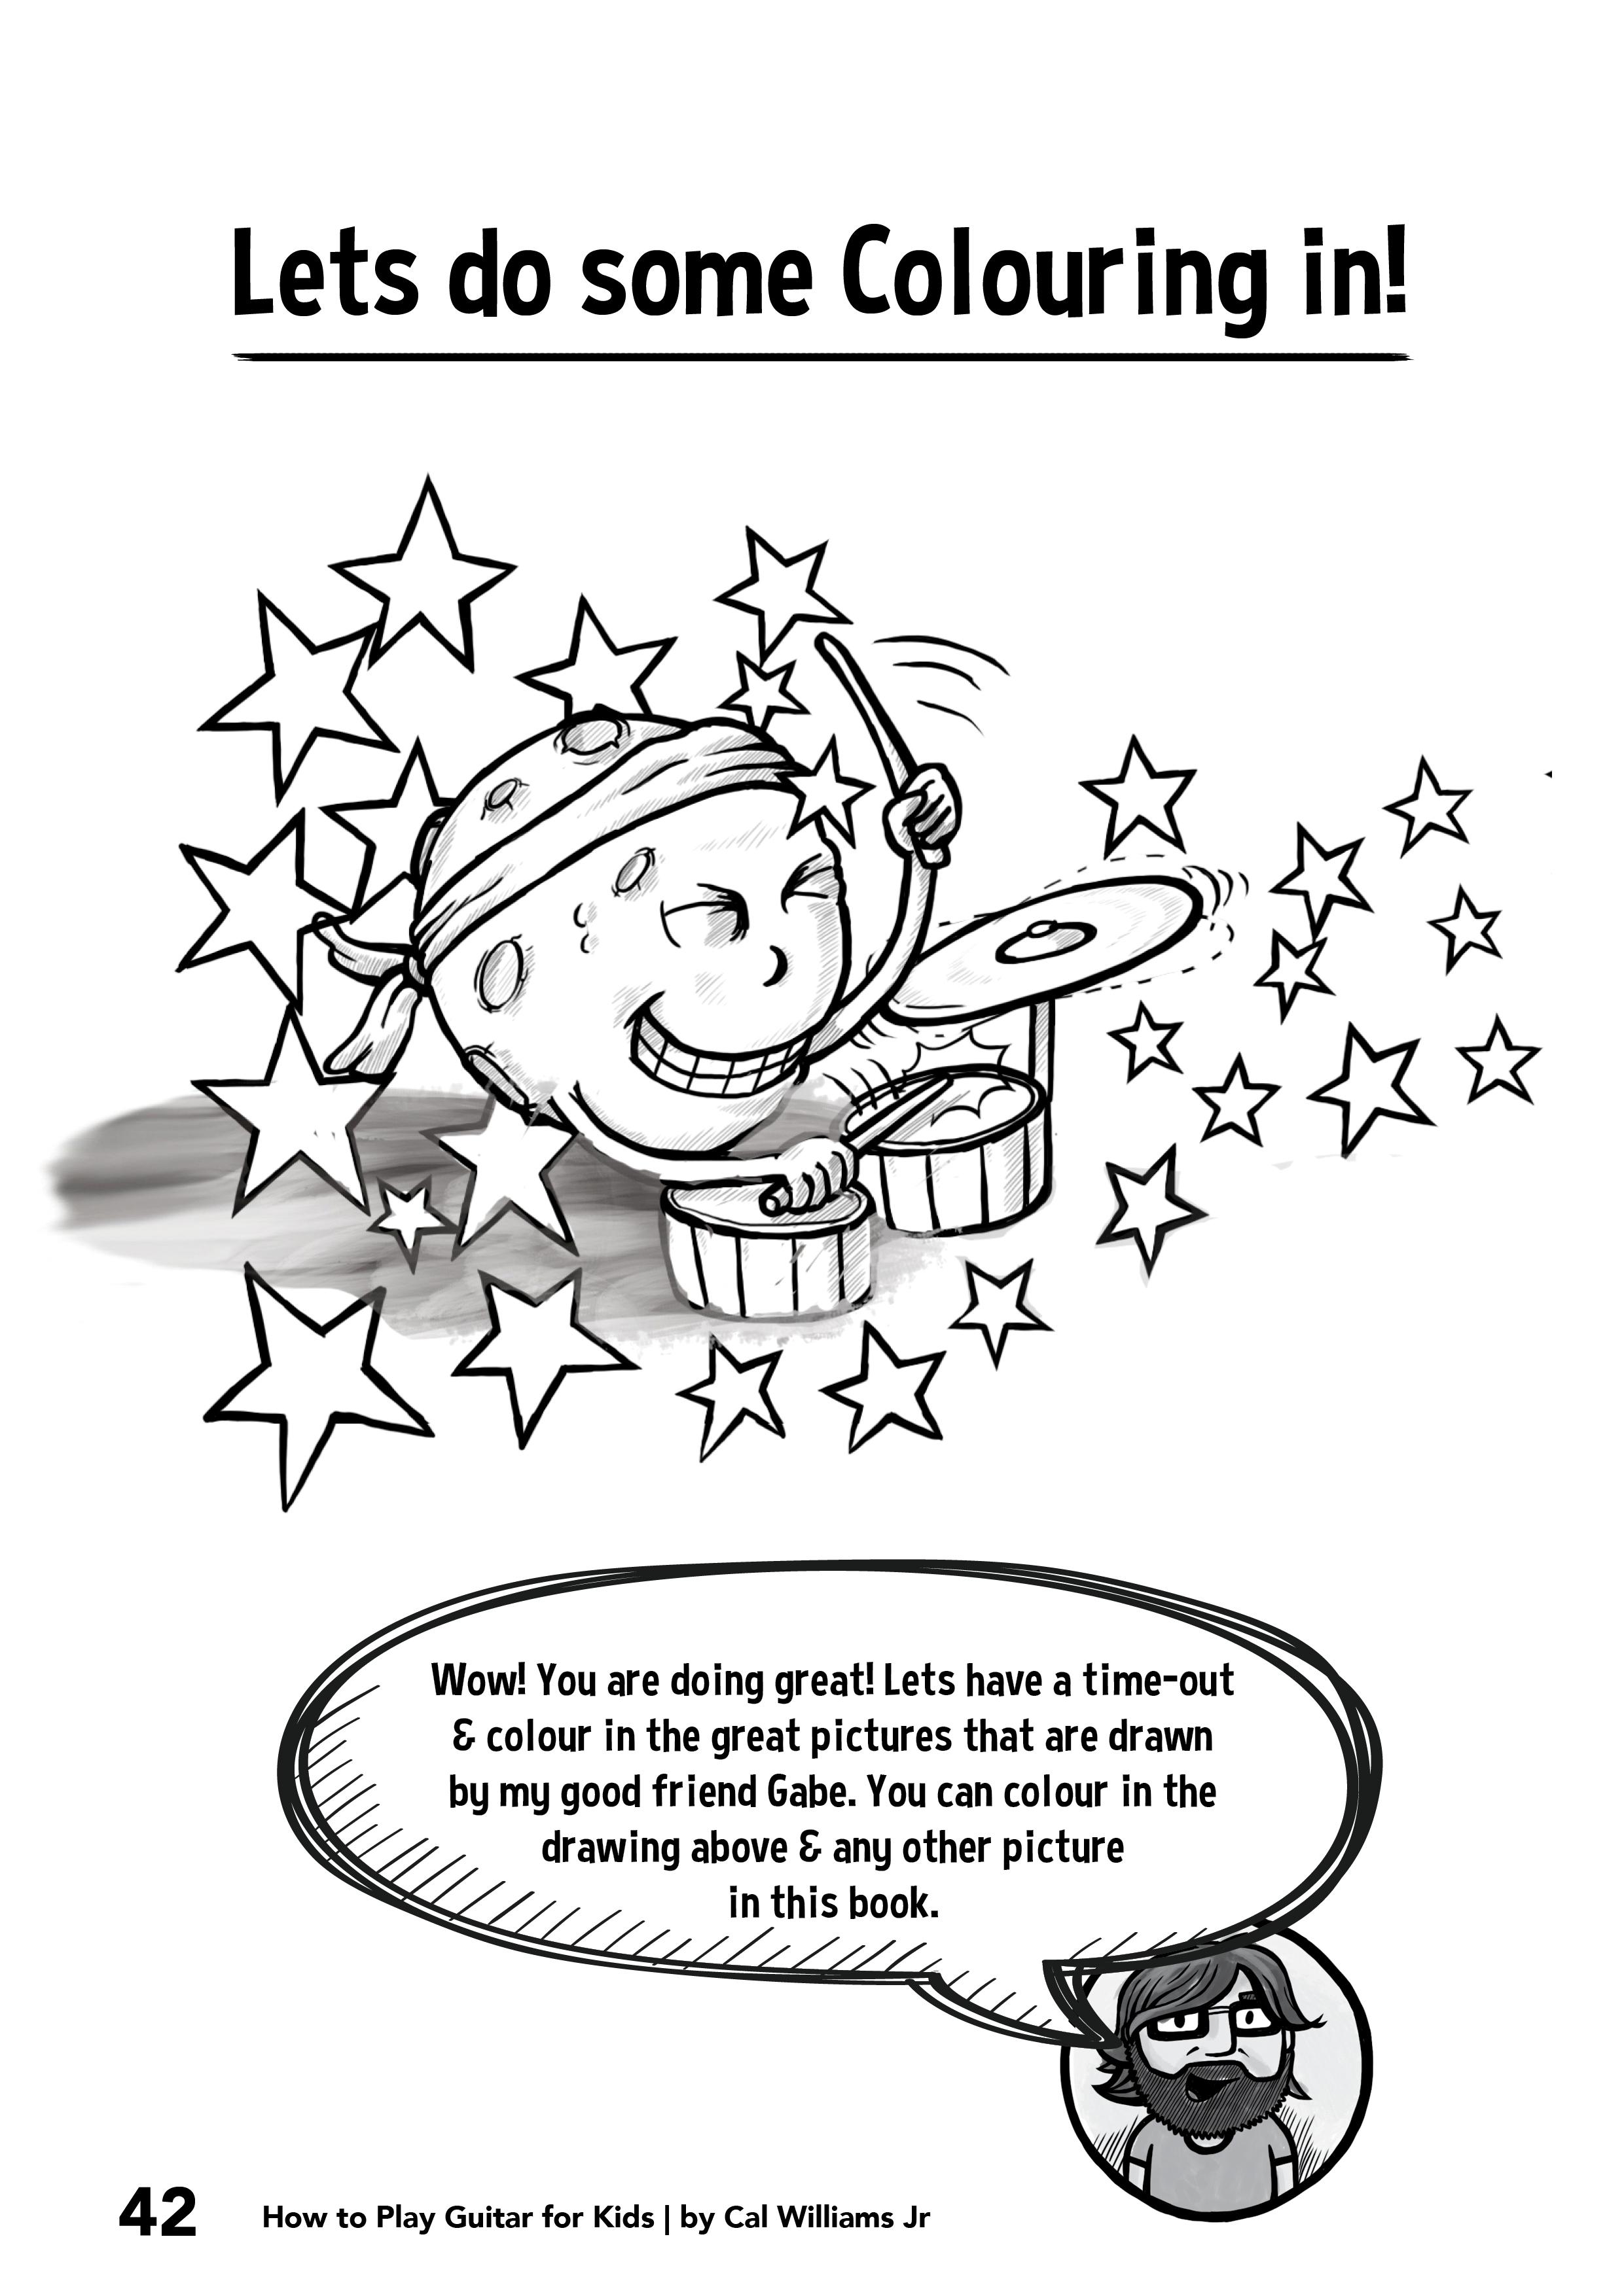 EASY GUITAR FOR KIDS P42